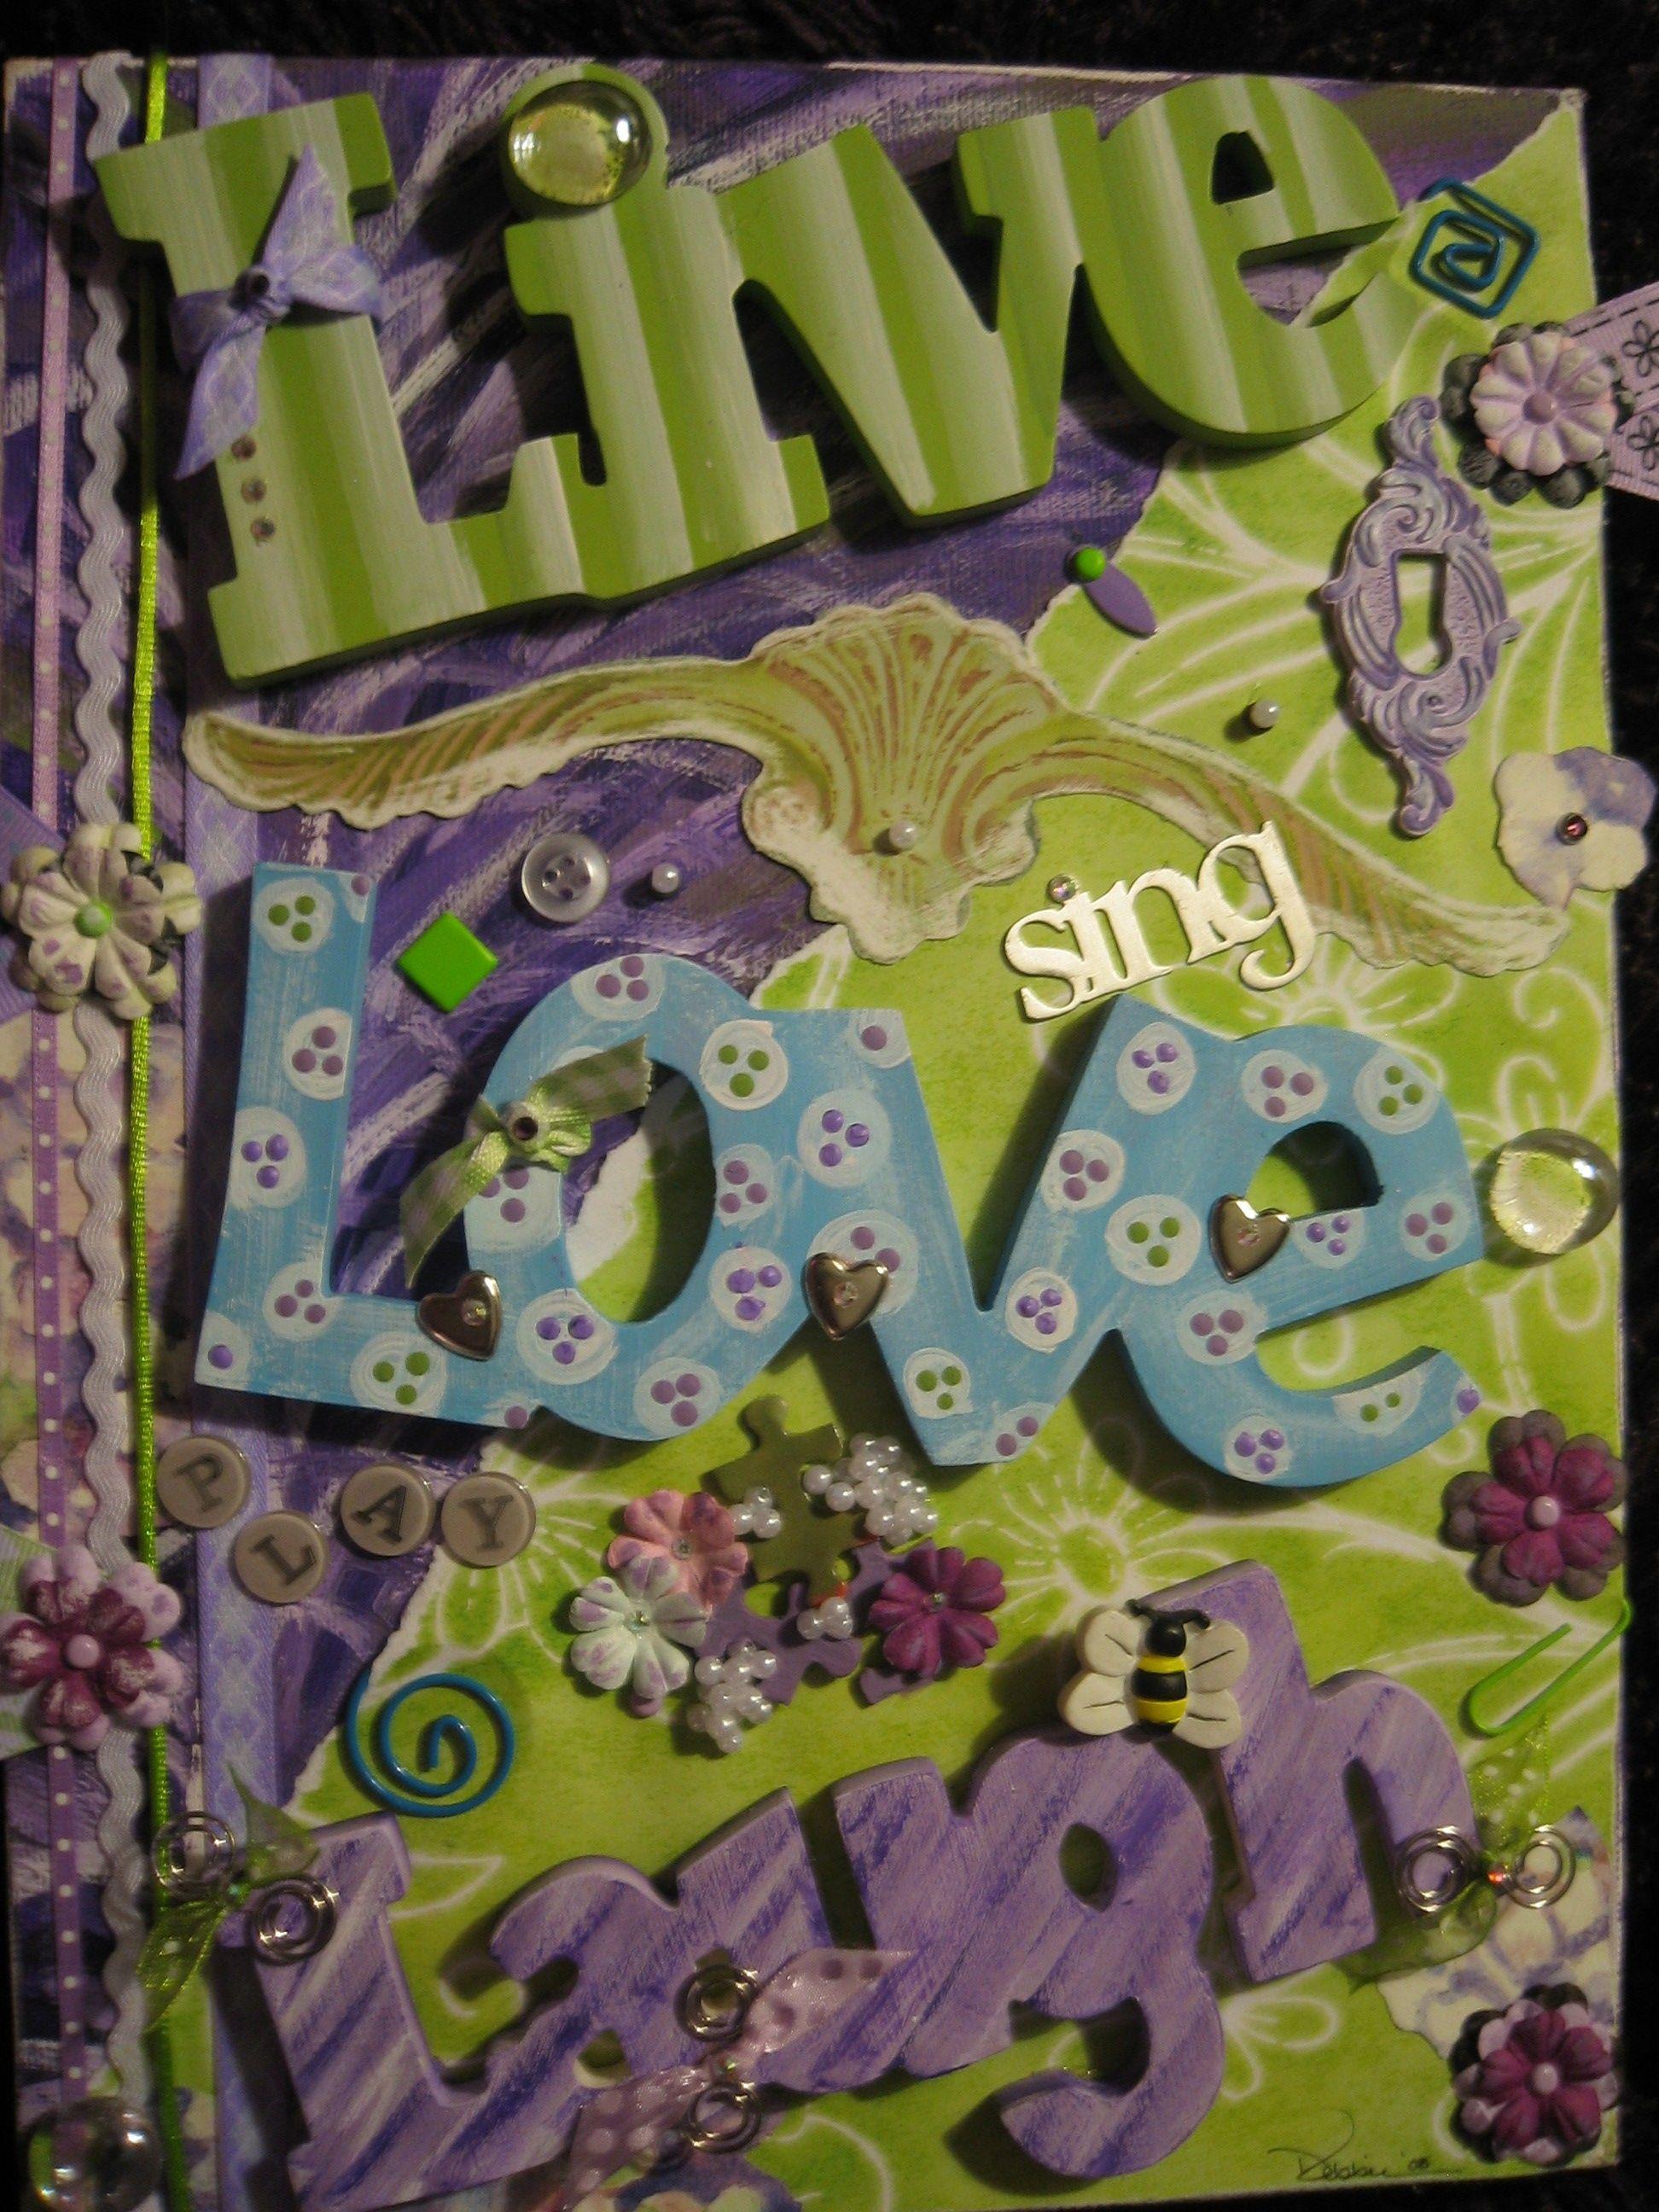 Scrapbook ideas on canvas - Altered Canvas Live Love And Laugh Scrapbook Com